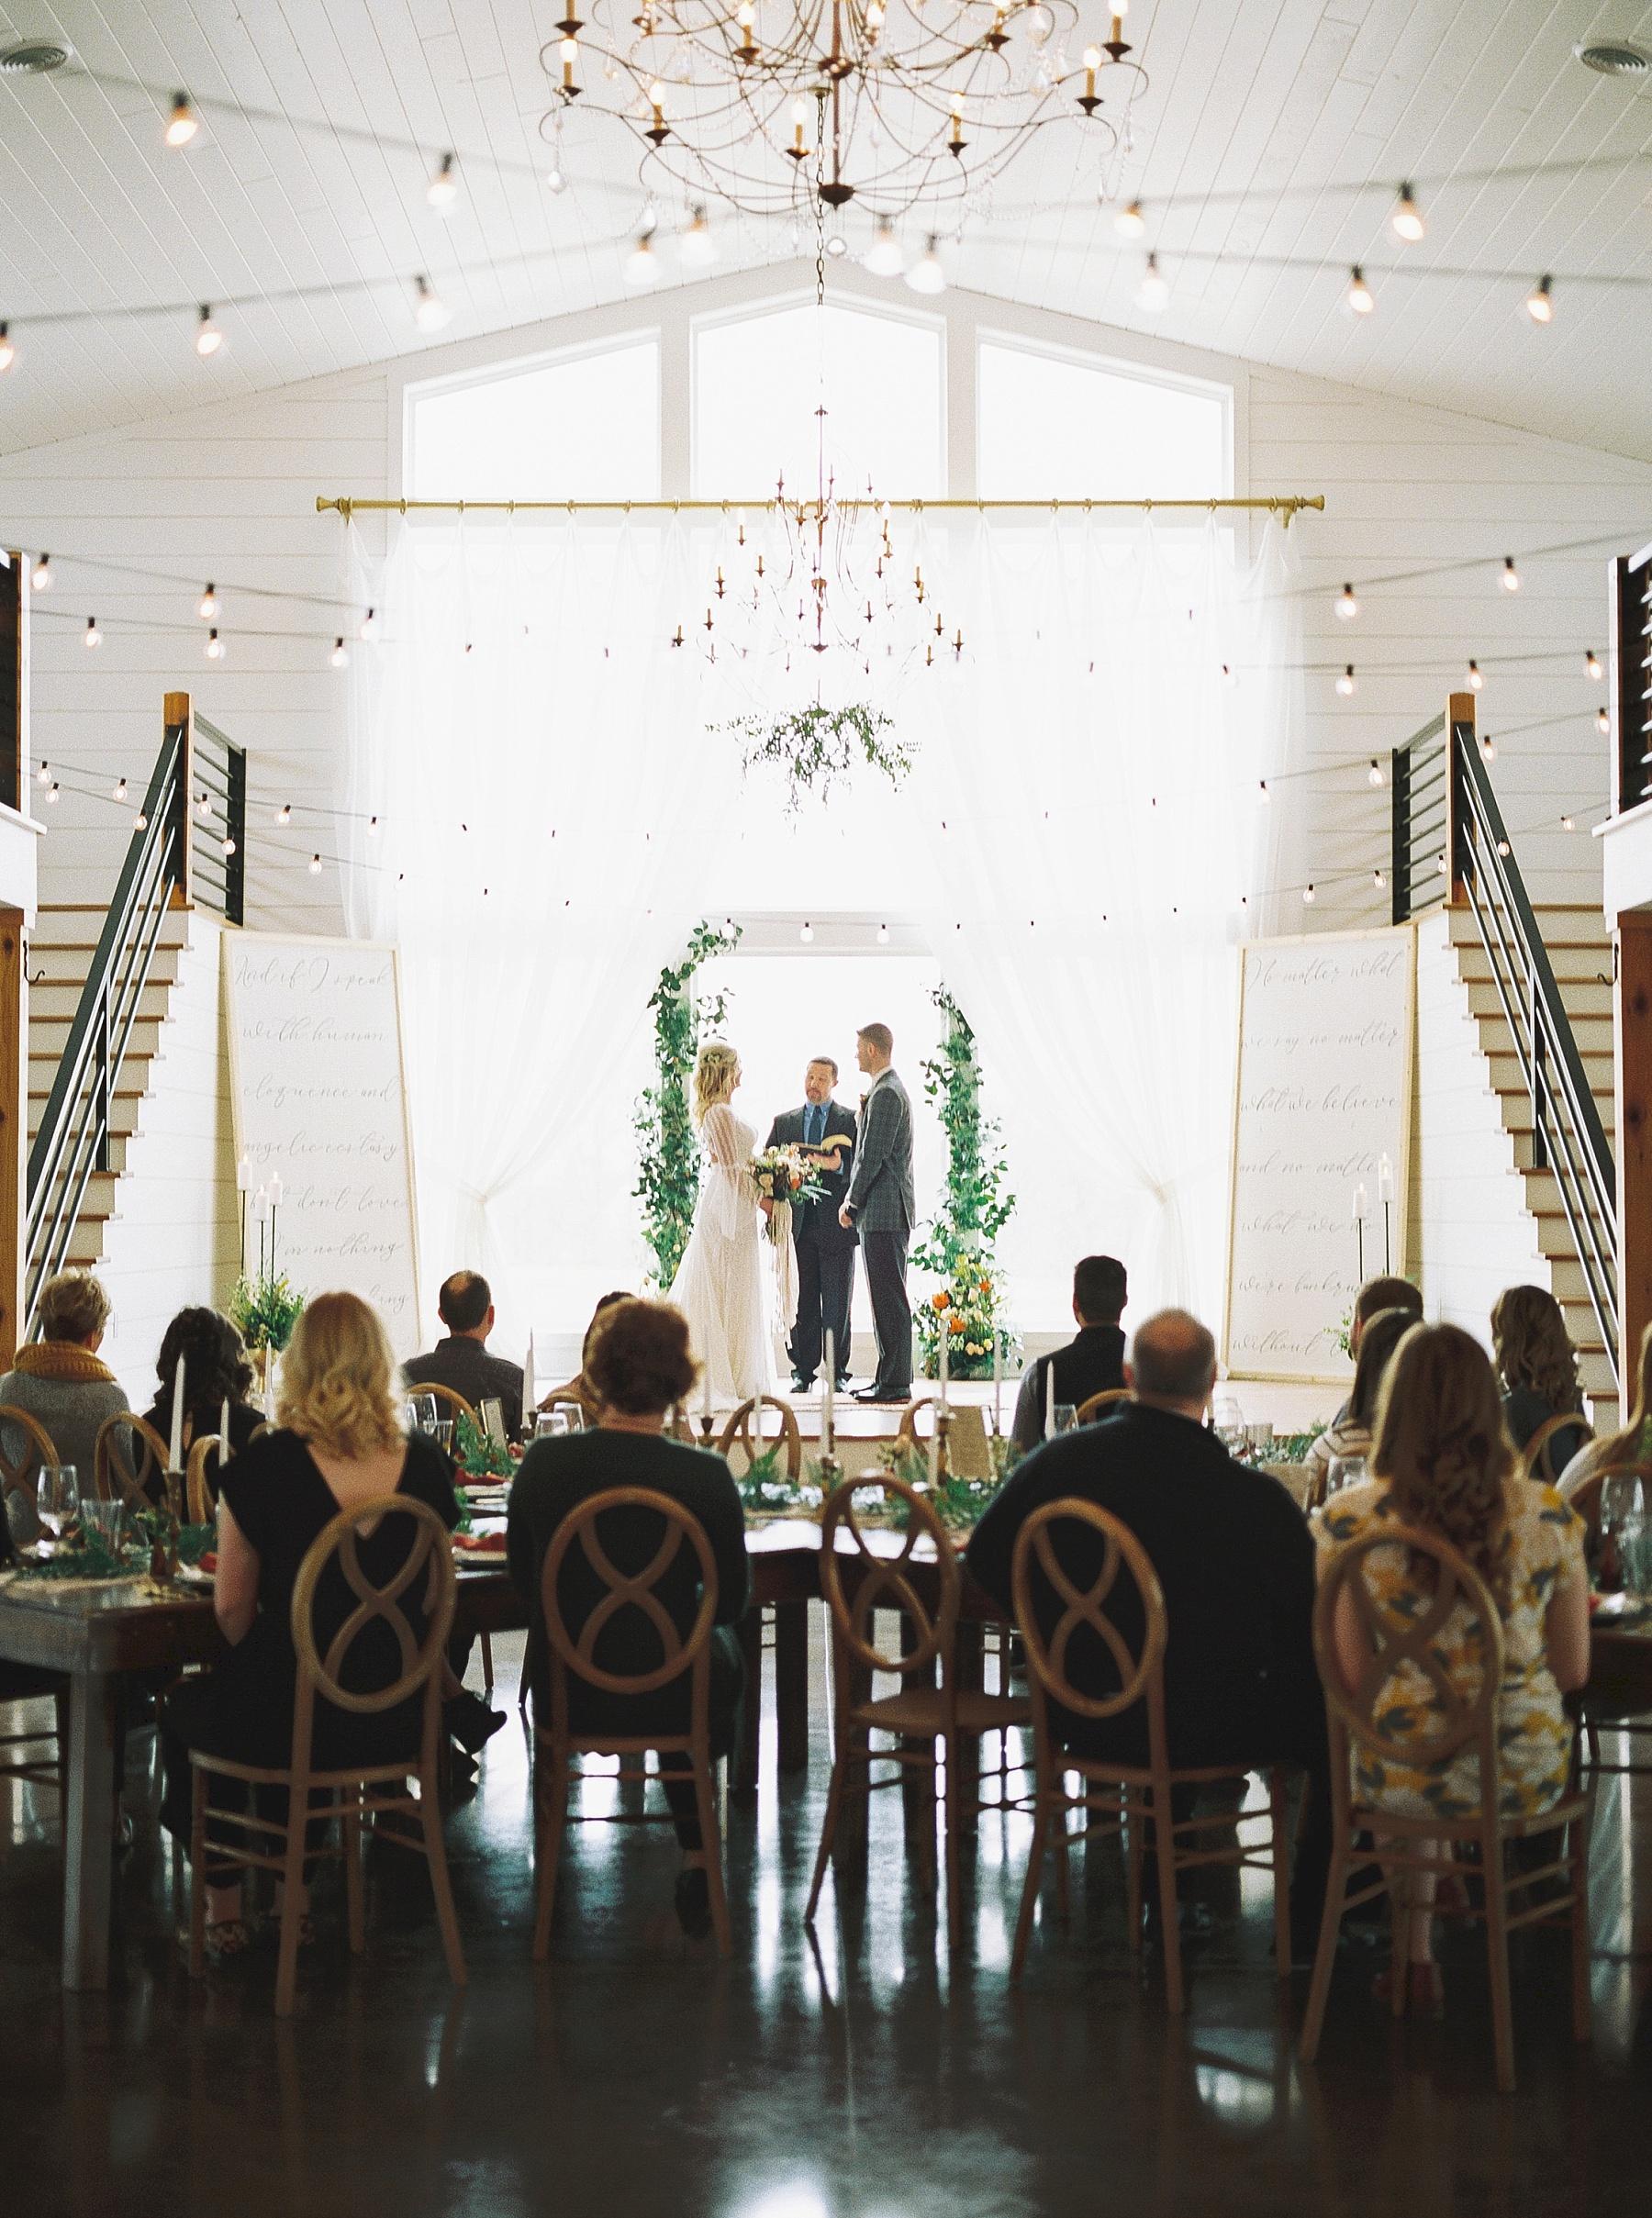 Eclectic Scandinavian Winter Wedding in All White Venue Emerson Fields by Kelsi Kliethermes Photography Best Missouri and Maui Wedding Photographer_0068.jpg